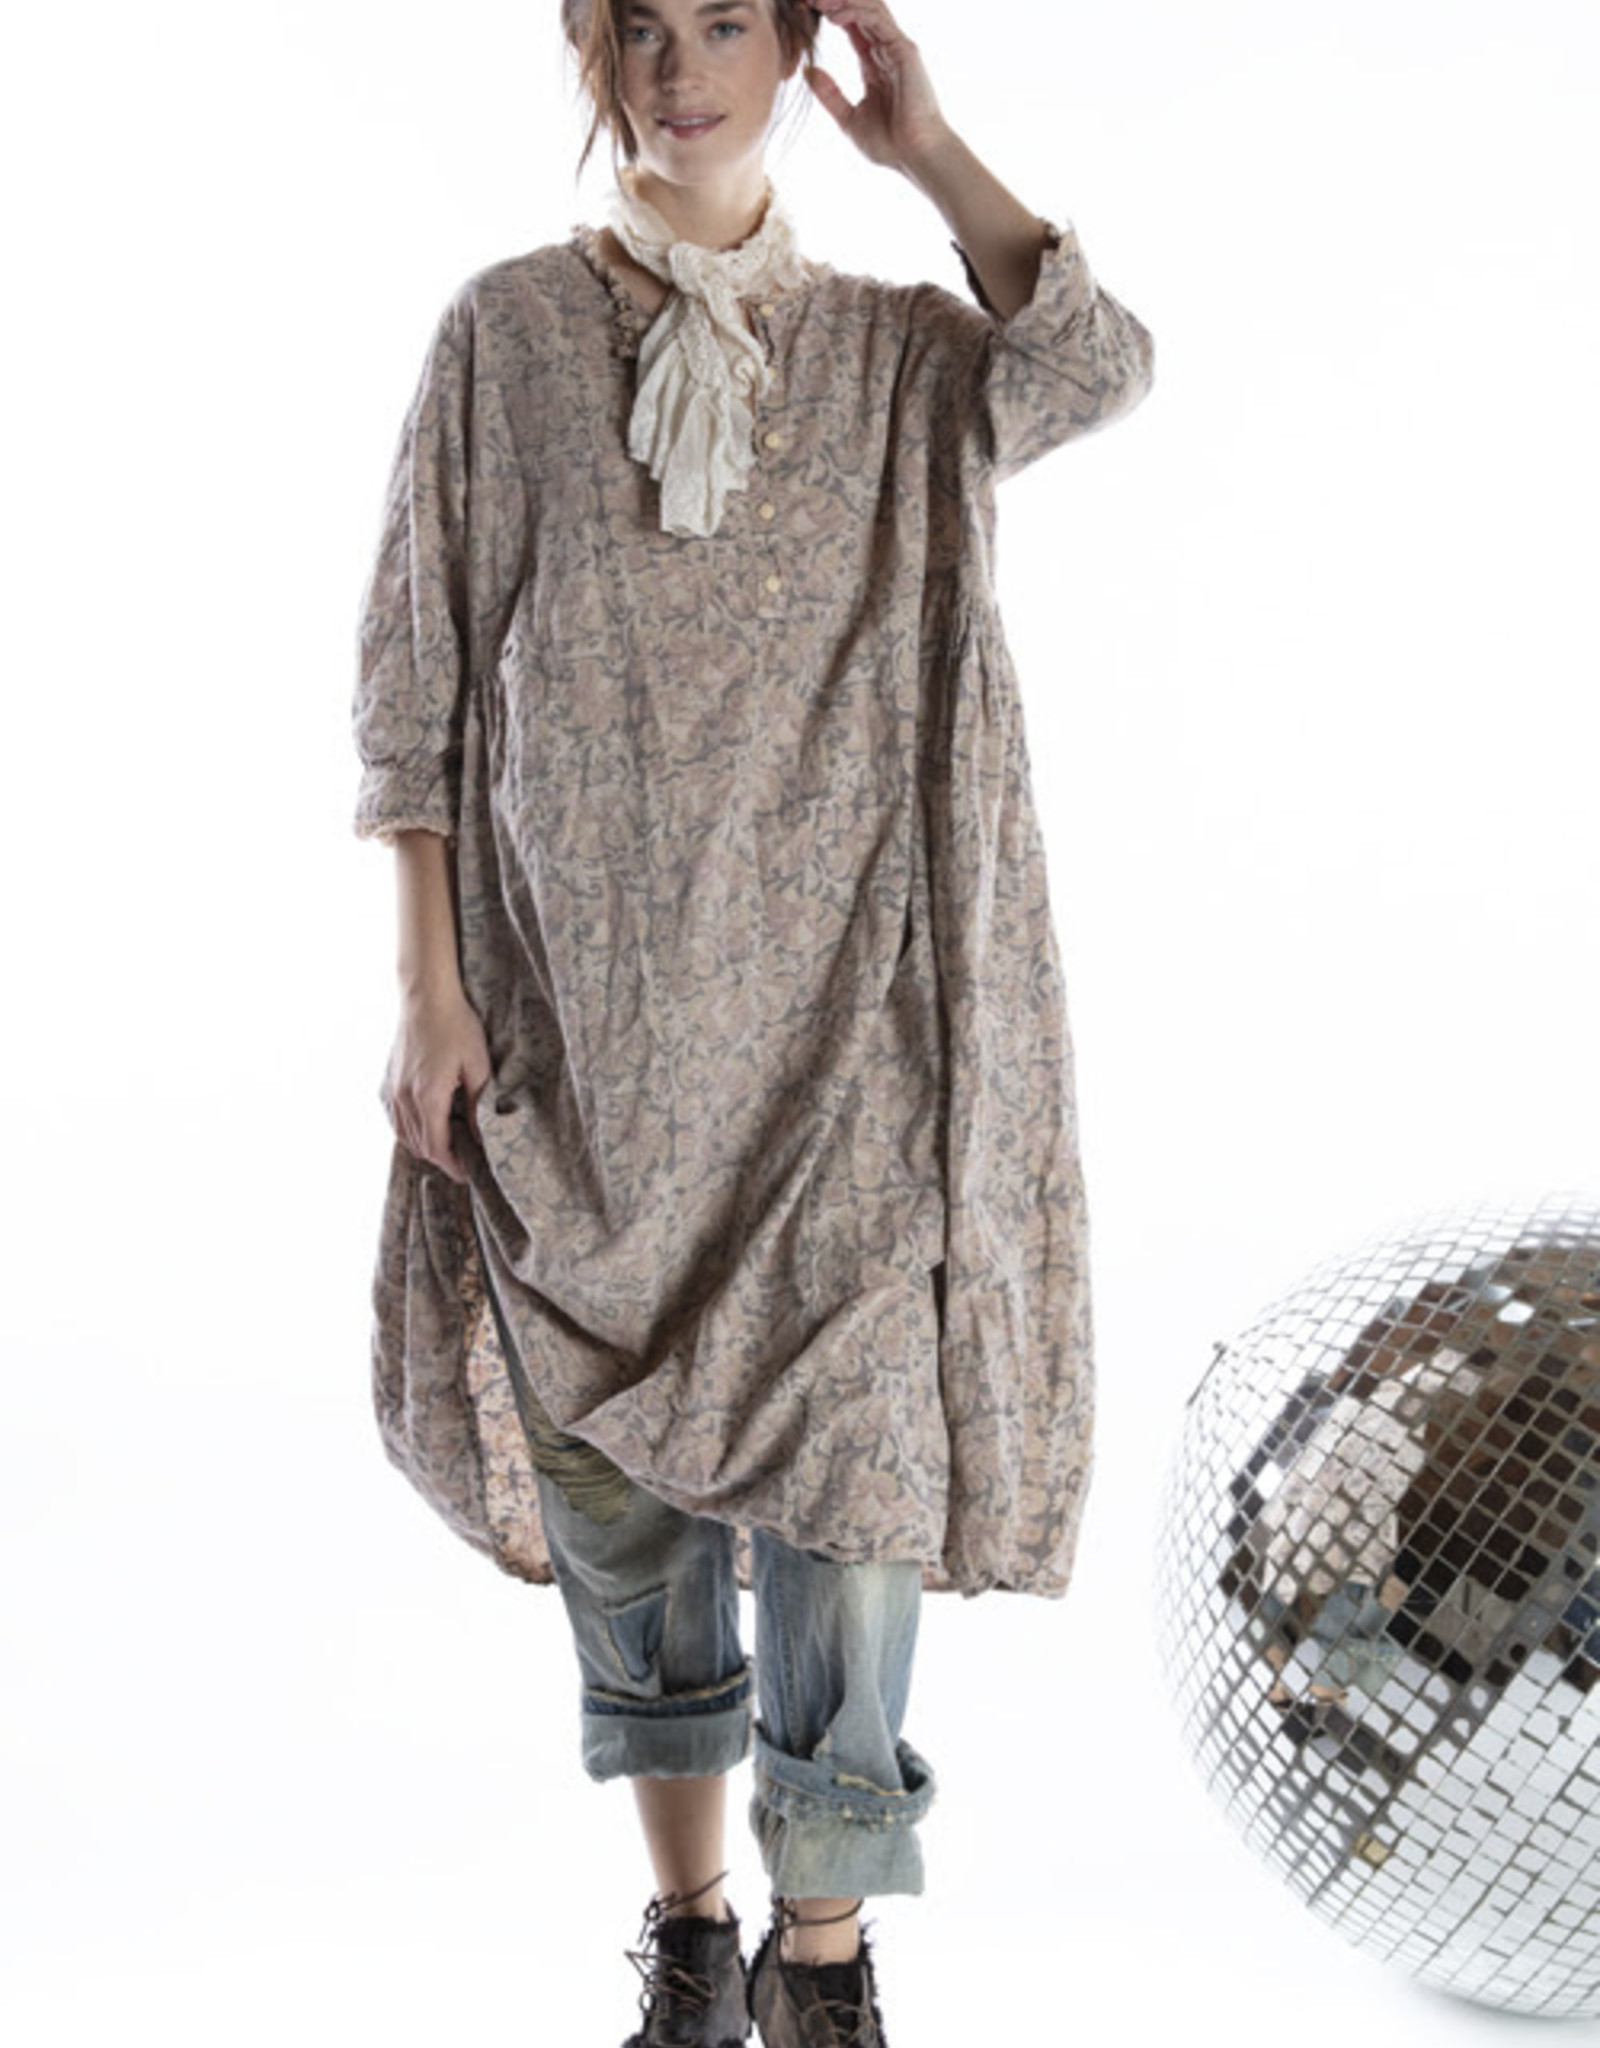 MAGNOLIA PEARL MAGNOLIA PEARL DRESS 697